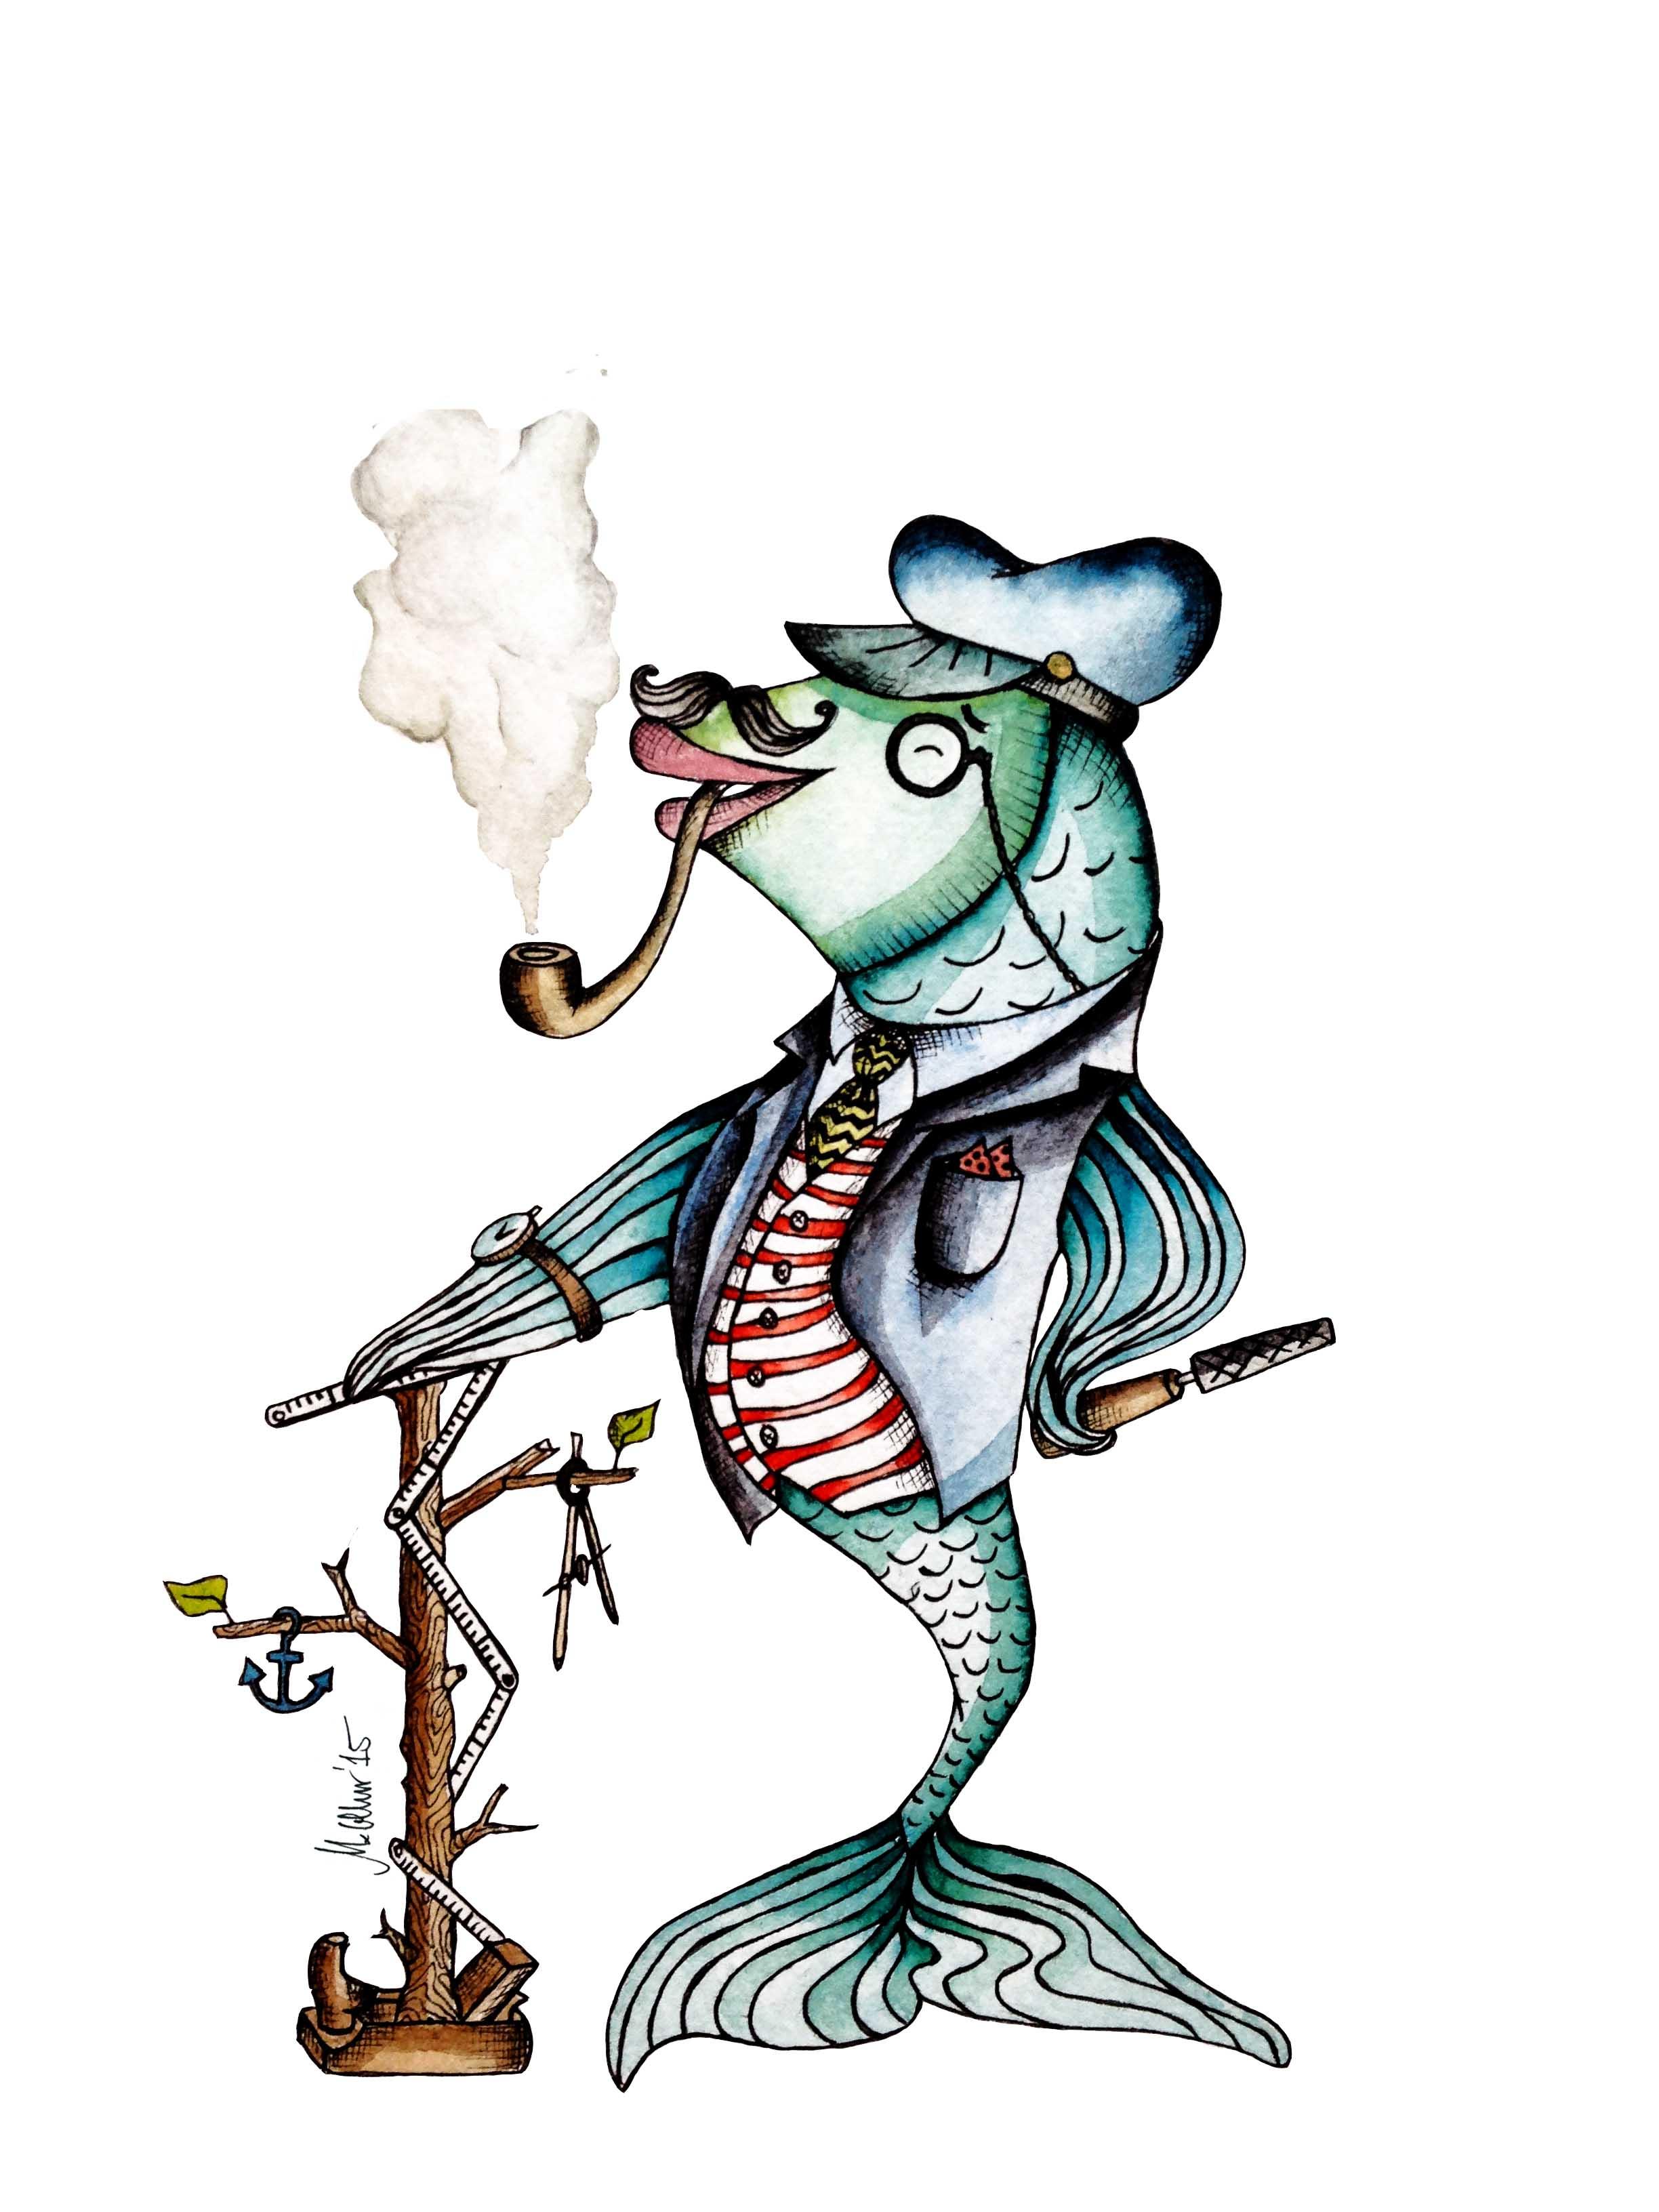 timberfish